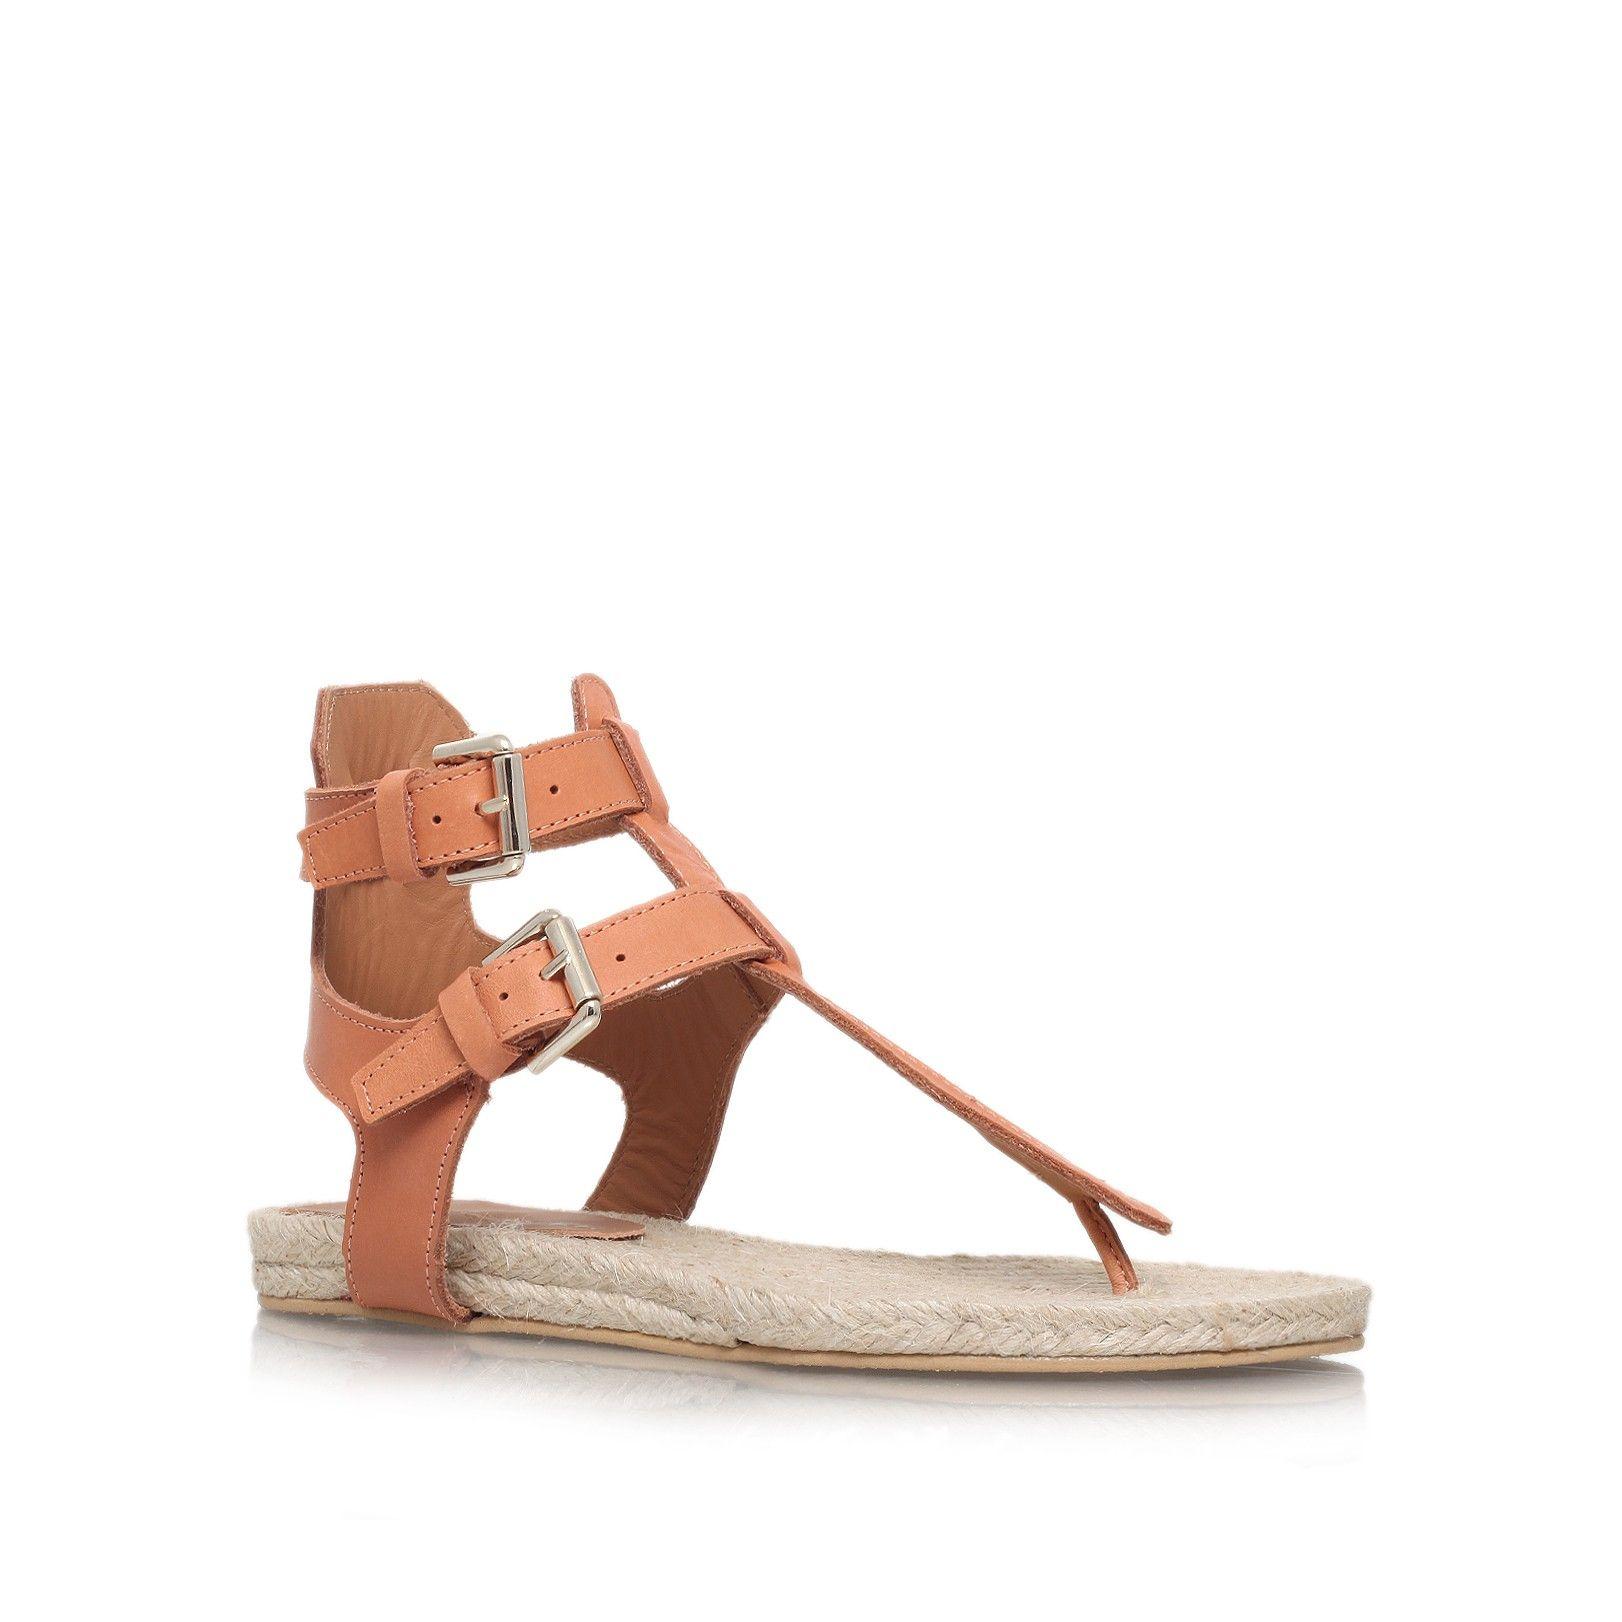 marla tan flat sandals from Kurt Geiger London